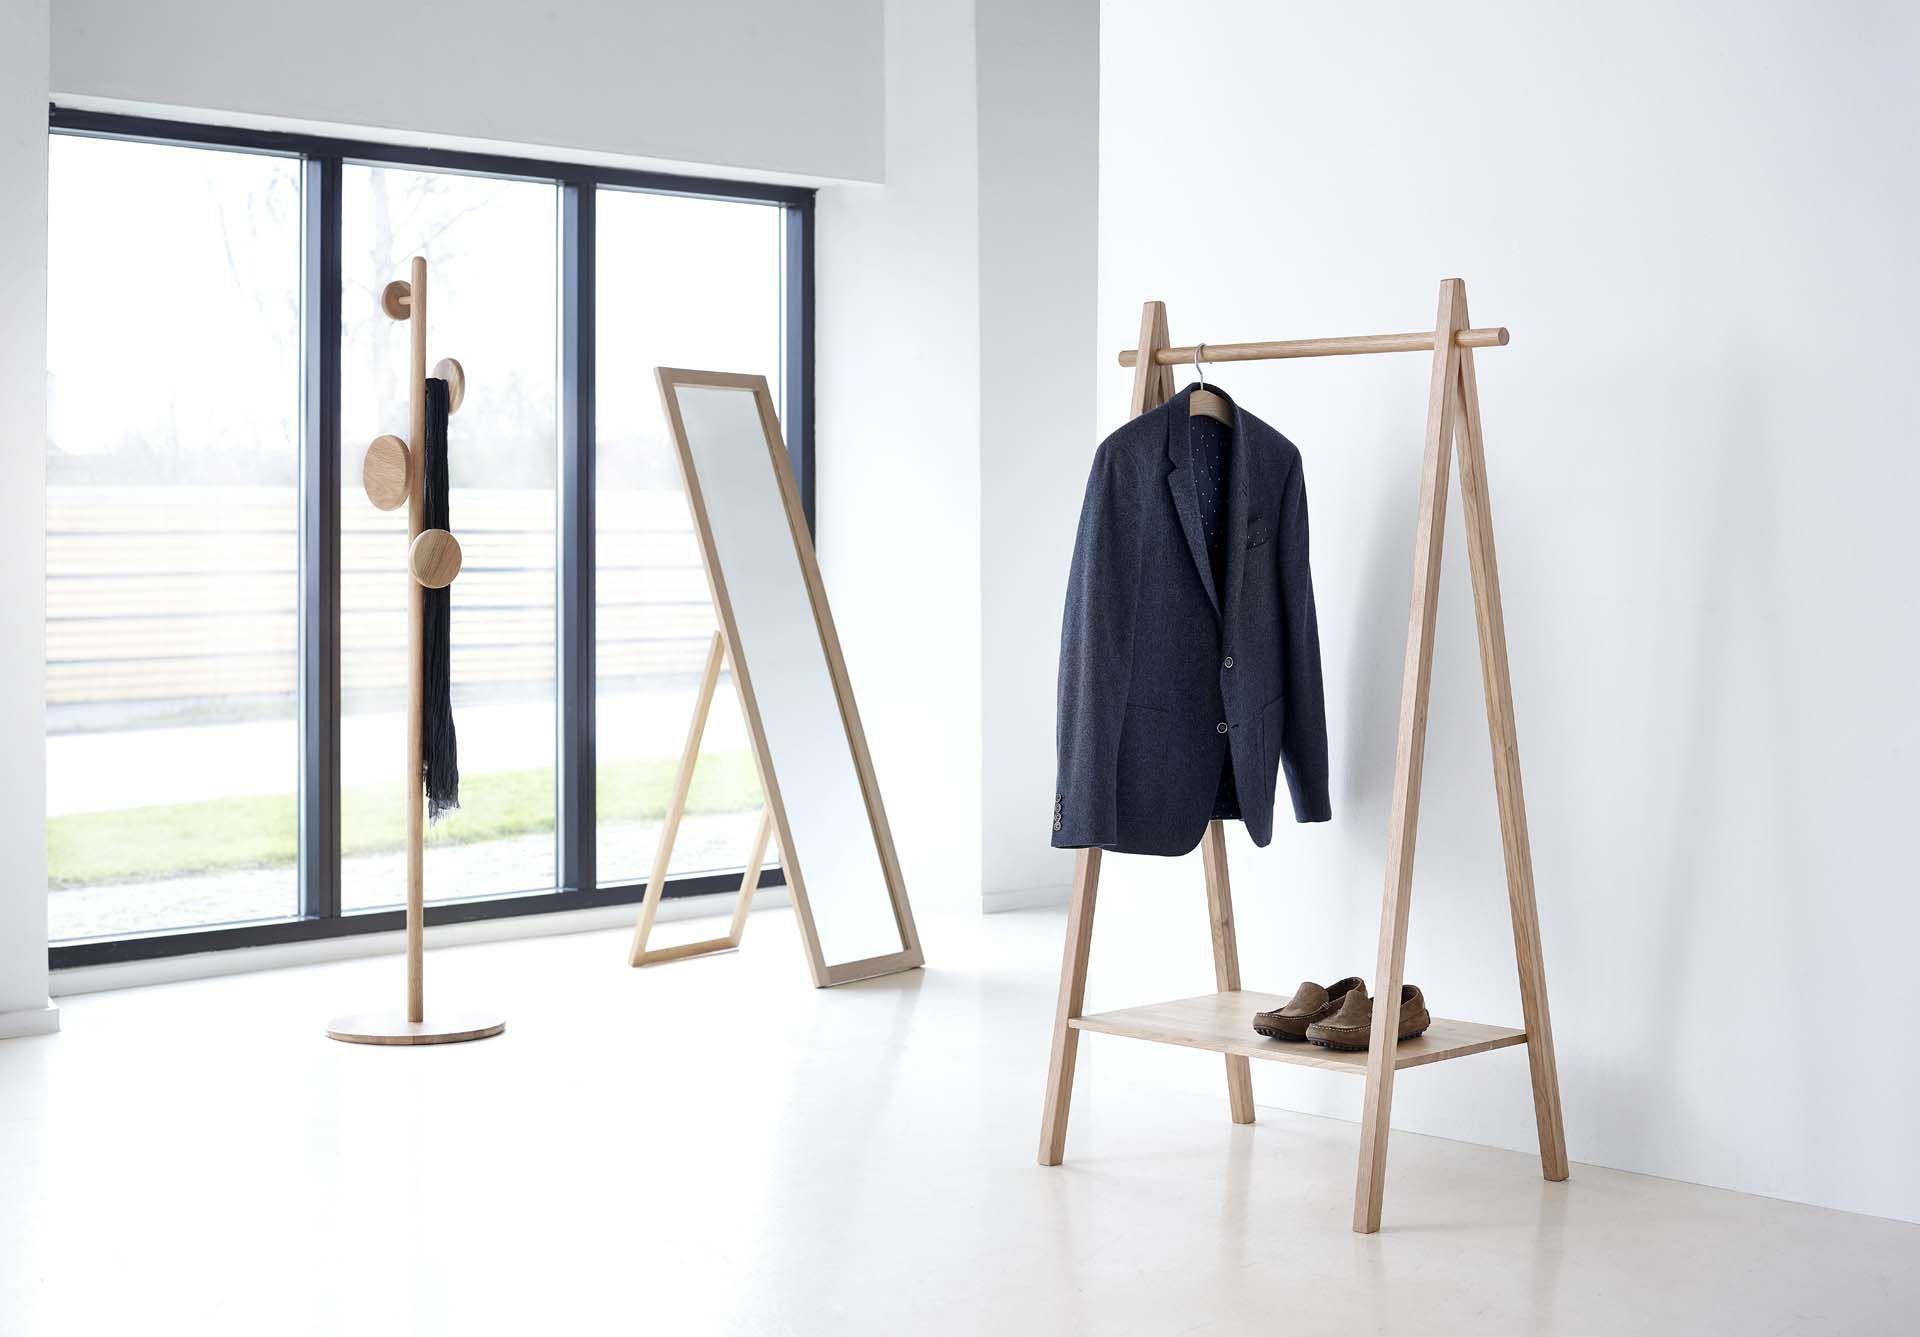 Appendiabiti da terra moderno in legno by dürr aps